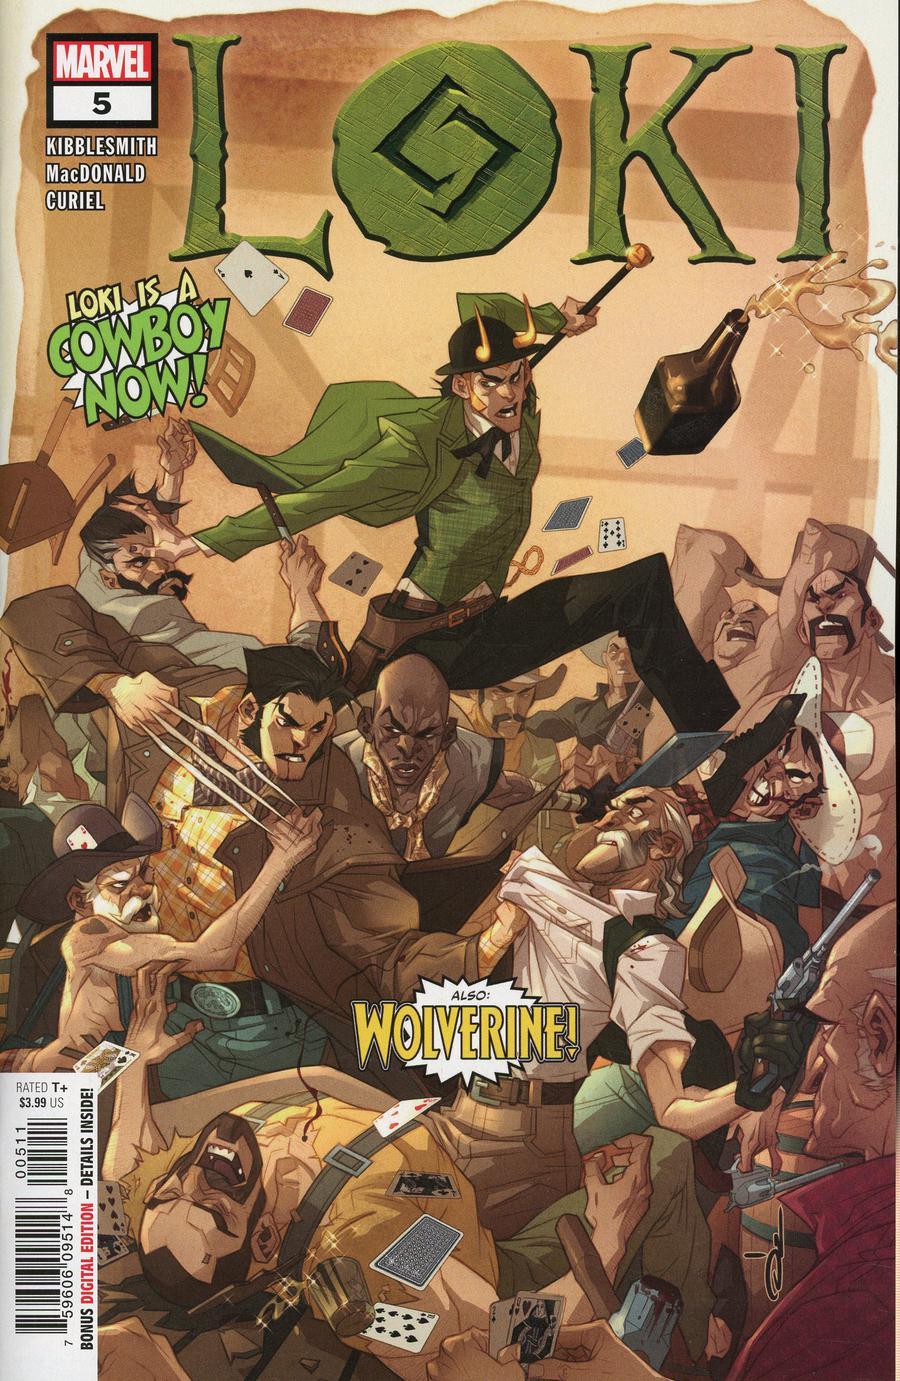 Loki Vol 3 #5 Cover A Regular Ozgur Yildirim Cover